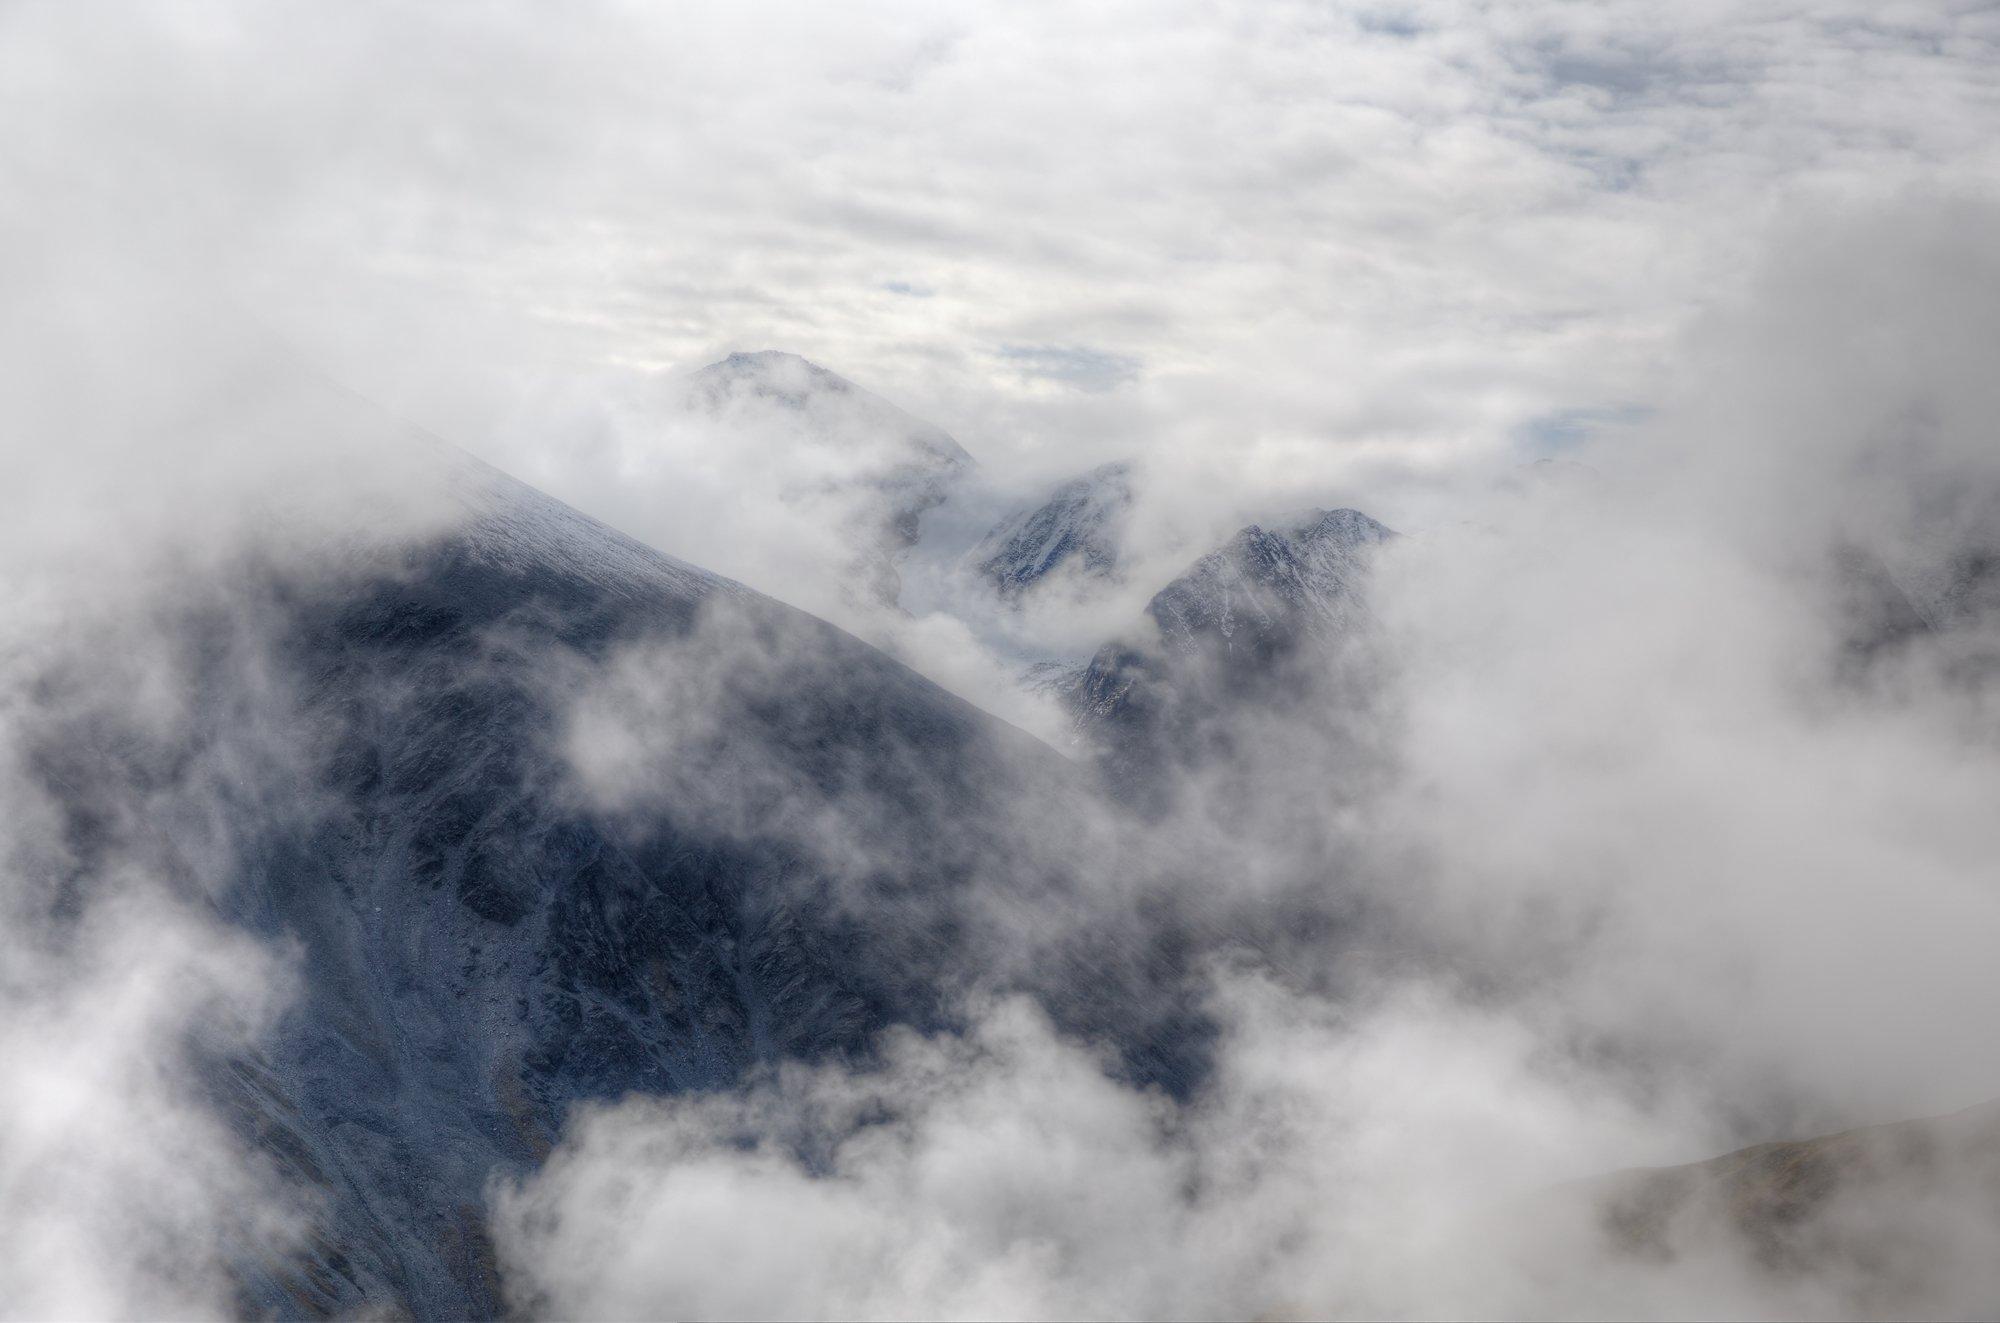 перевал, облака, туман, горы,, Кузнецов Сергей